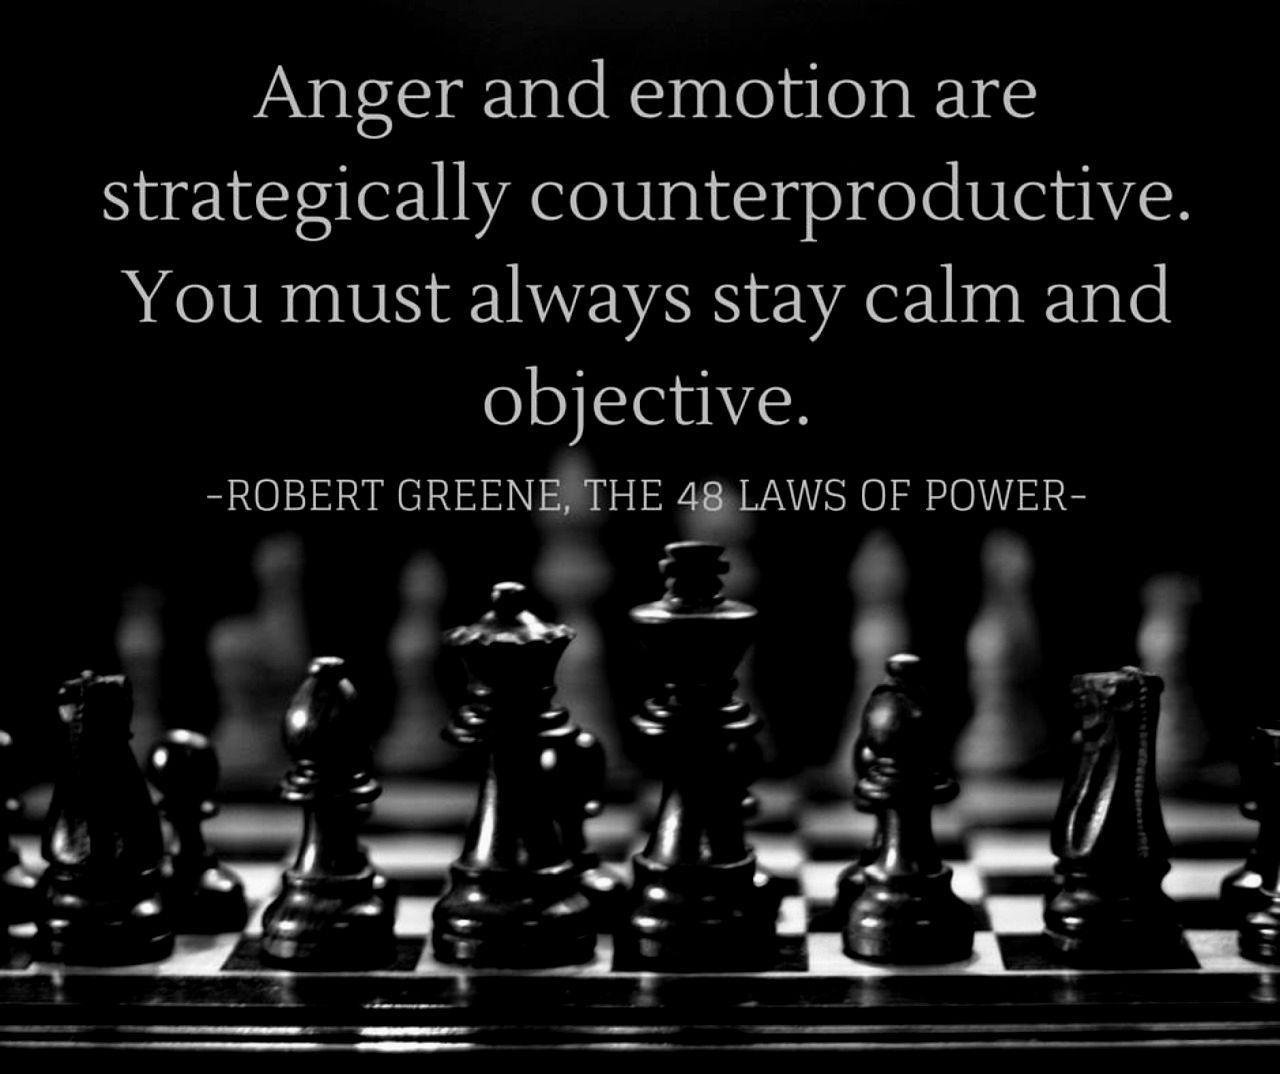 48 Laws Of Power Quotes: 48 Laws Of Power Quotes – The Quotes